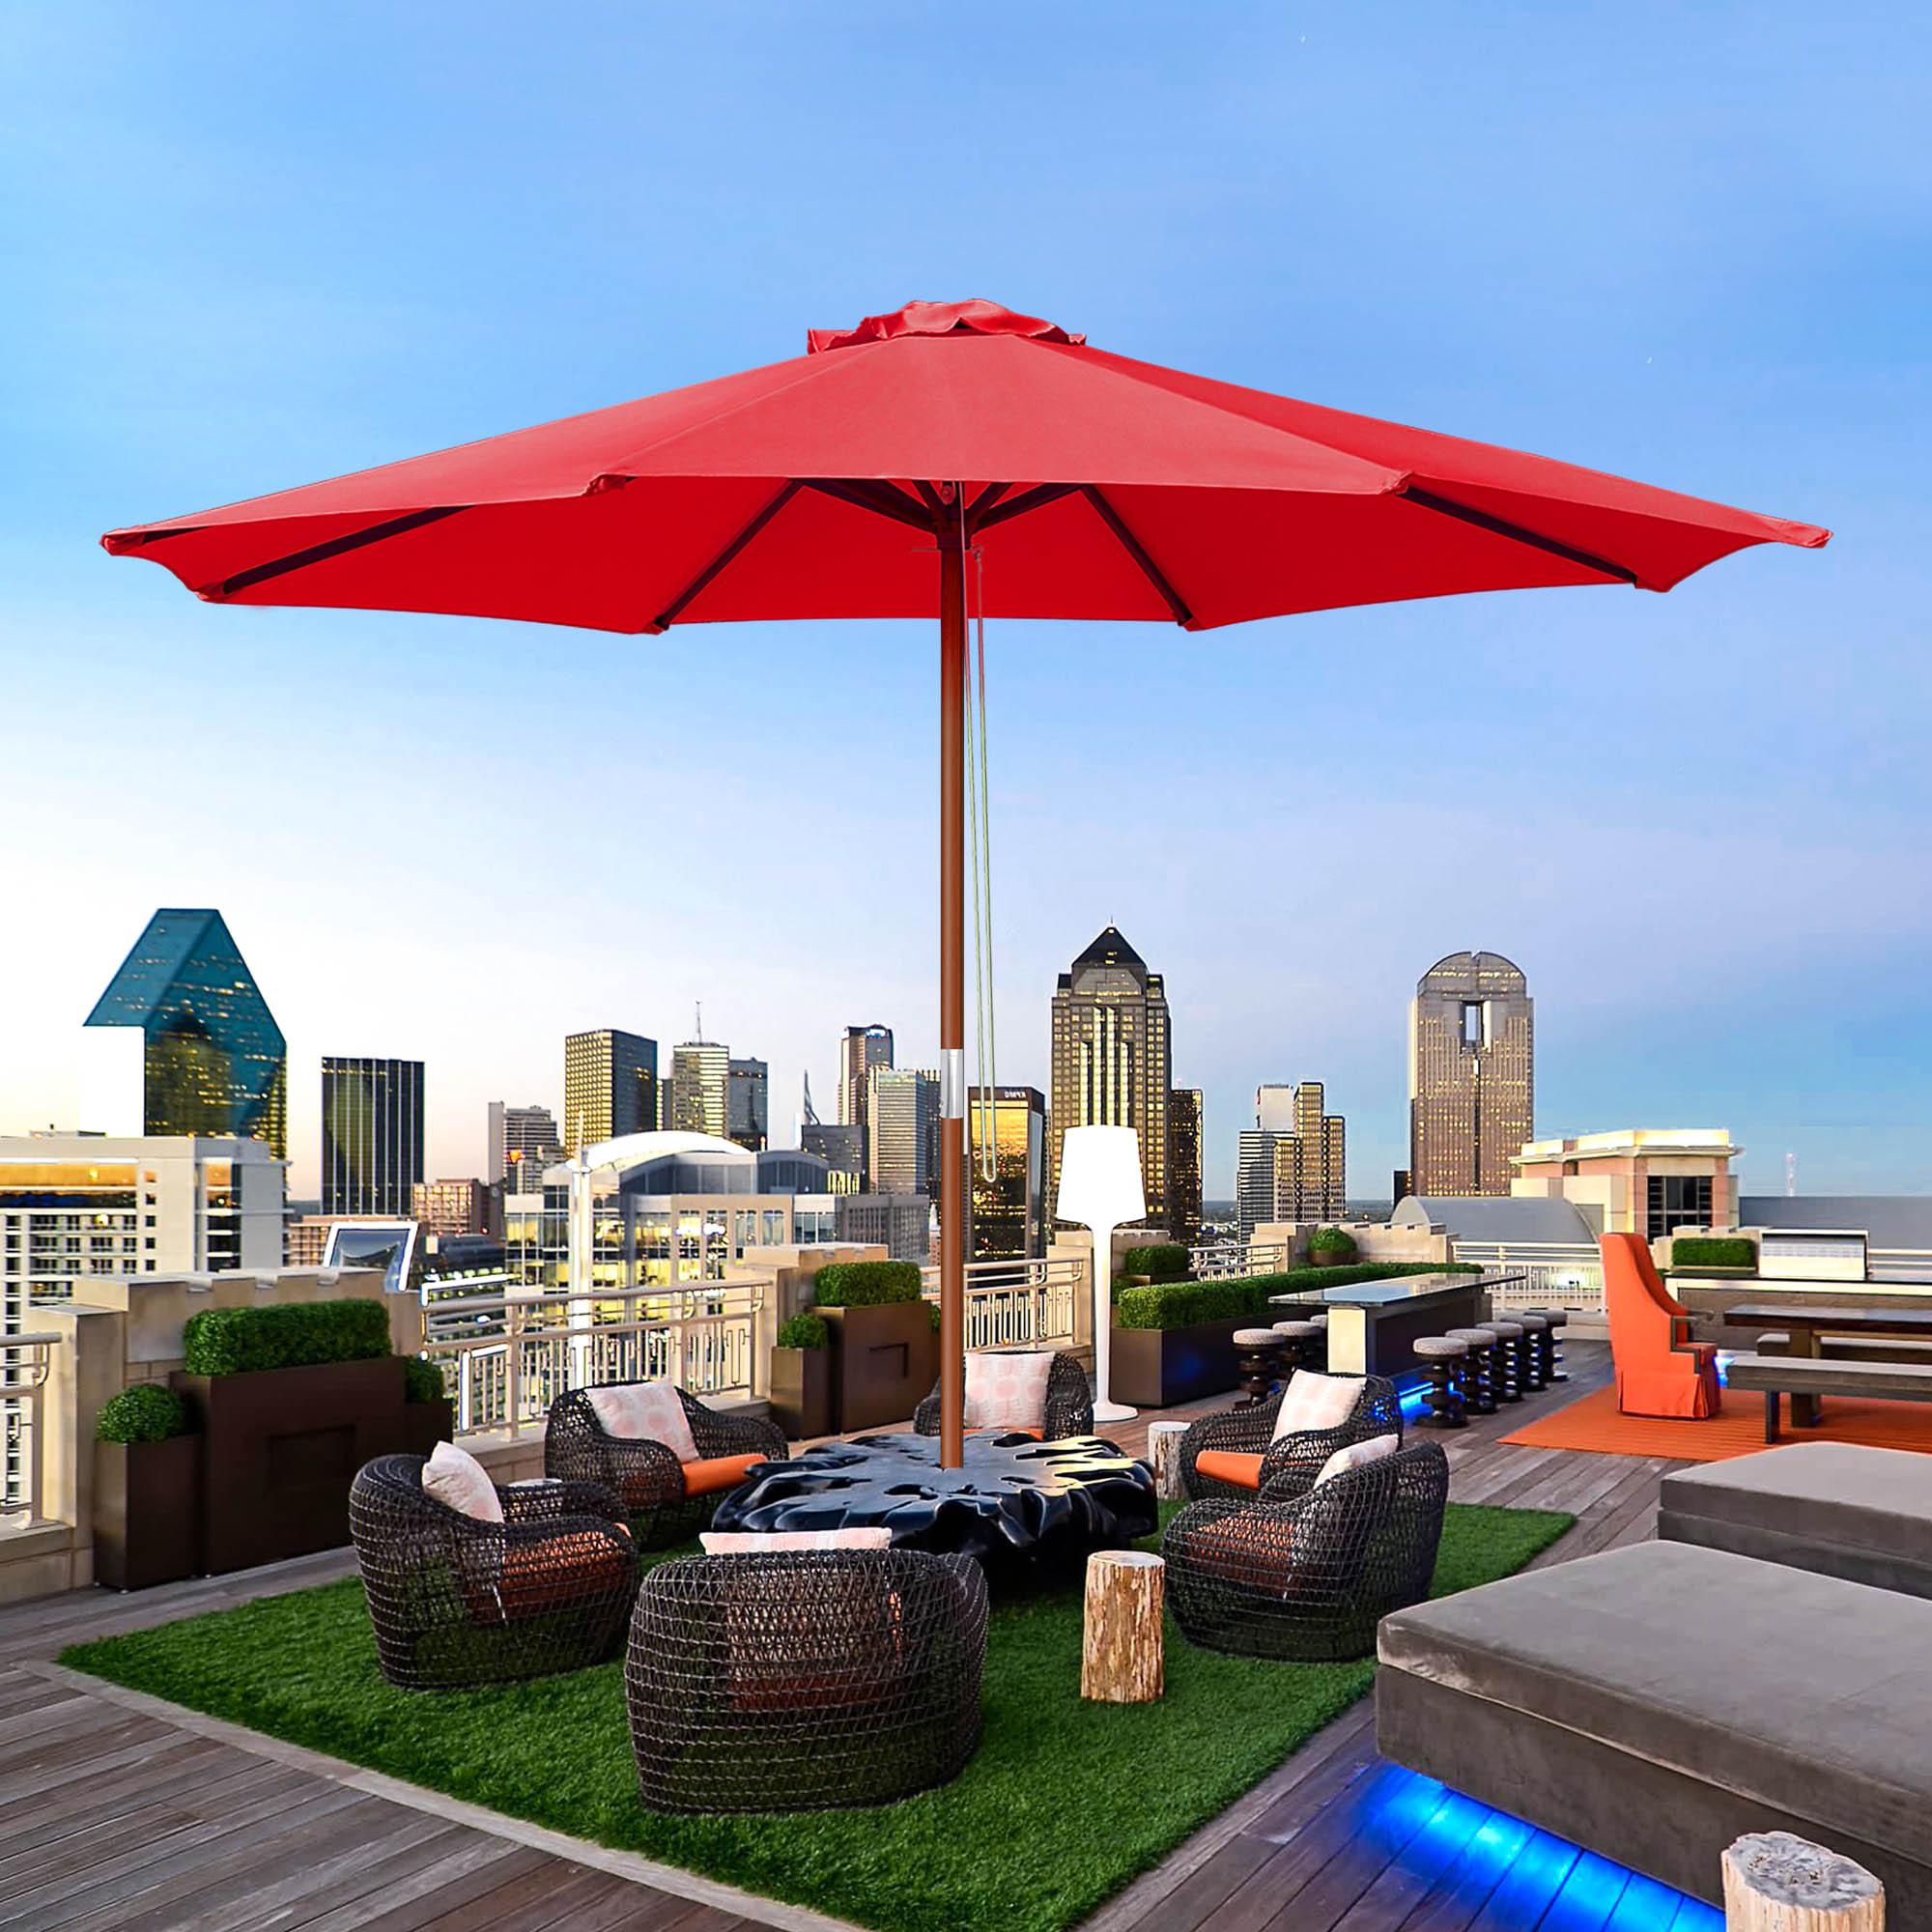 9ft wooden outdoor patio umbrella pulley garden yard beach wedding sunshade red 637509491154 ebay